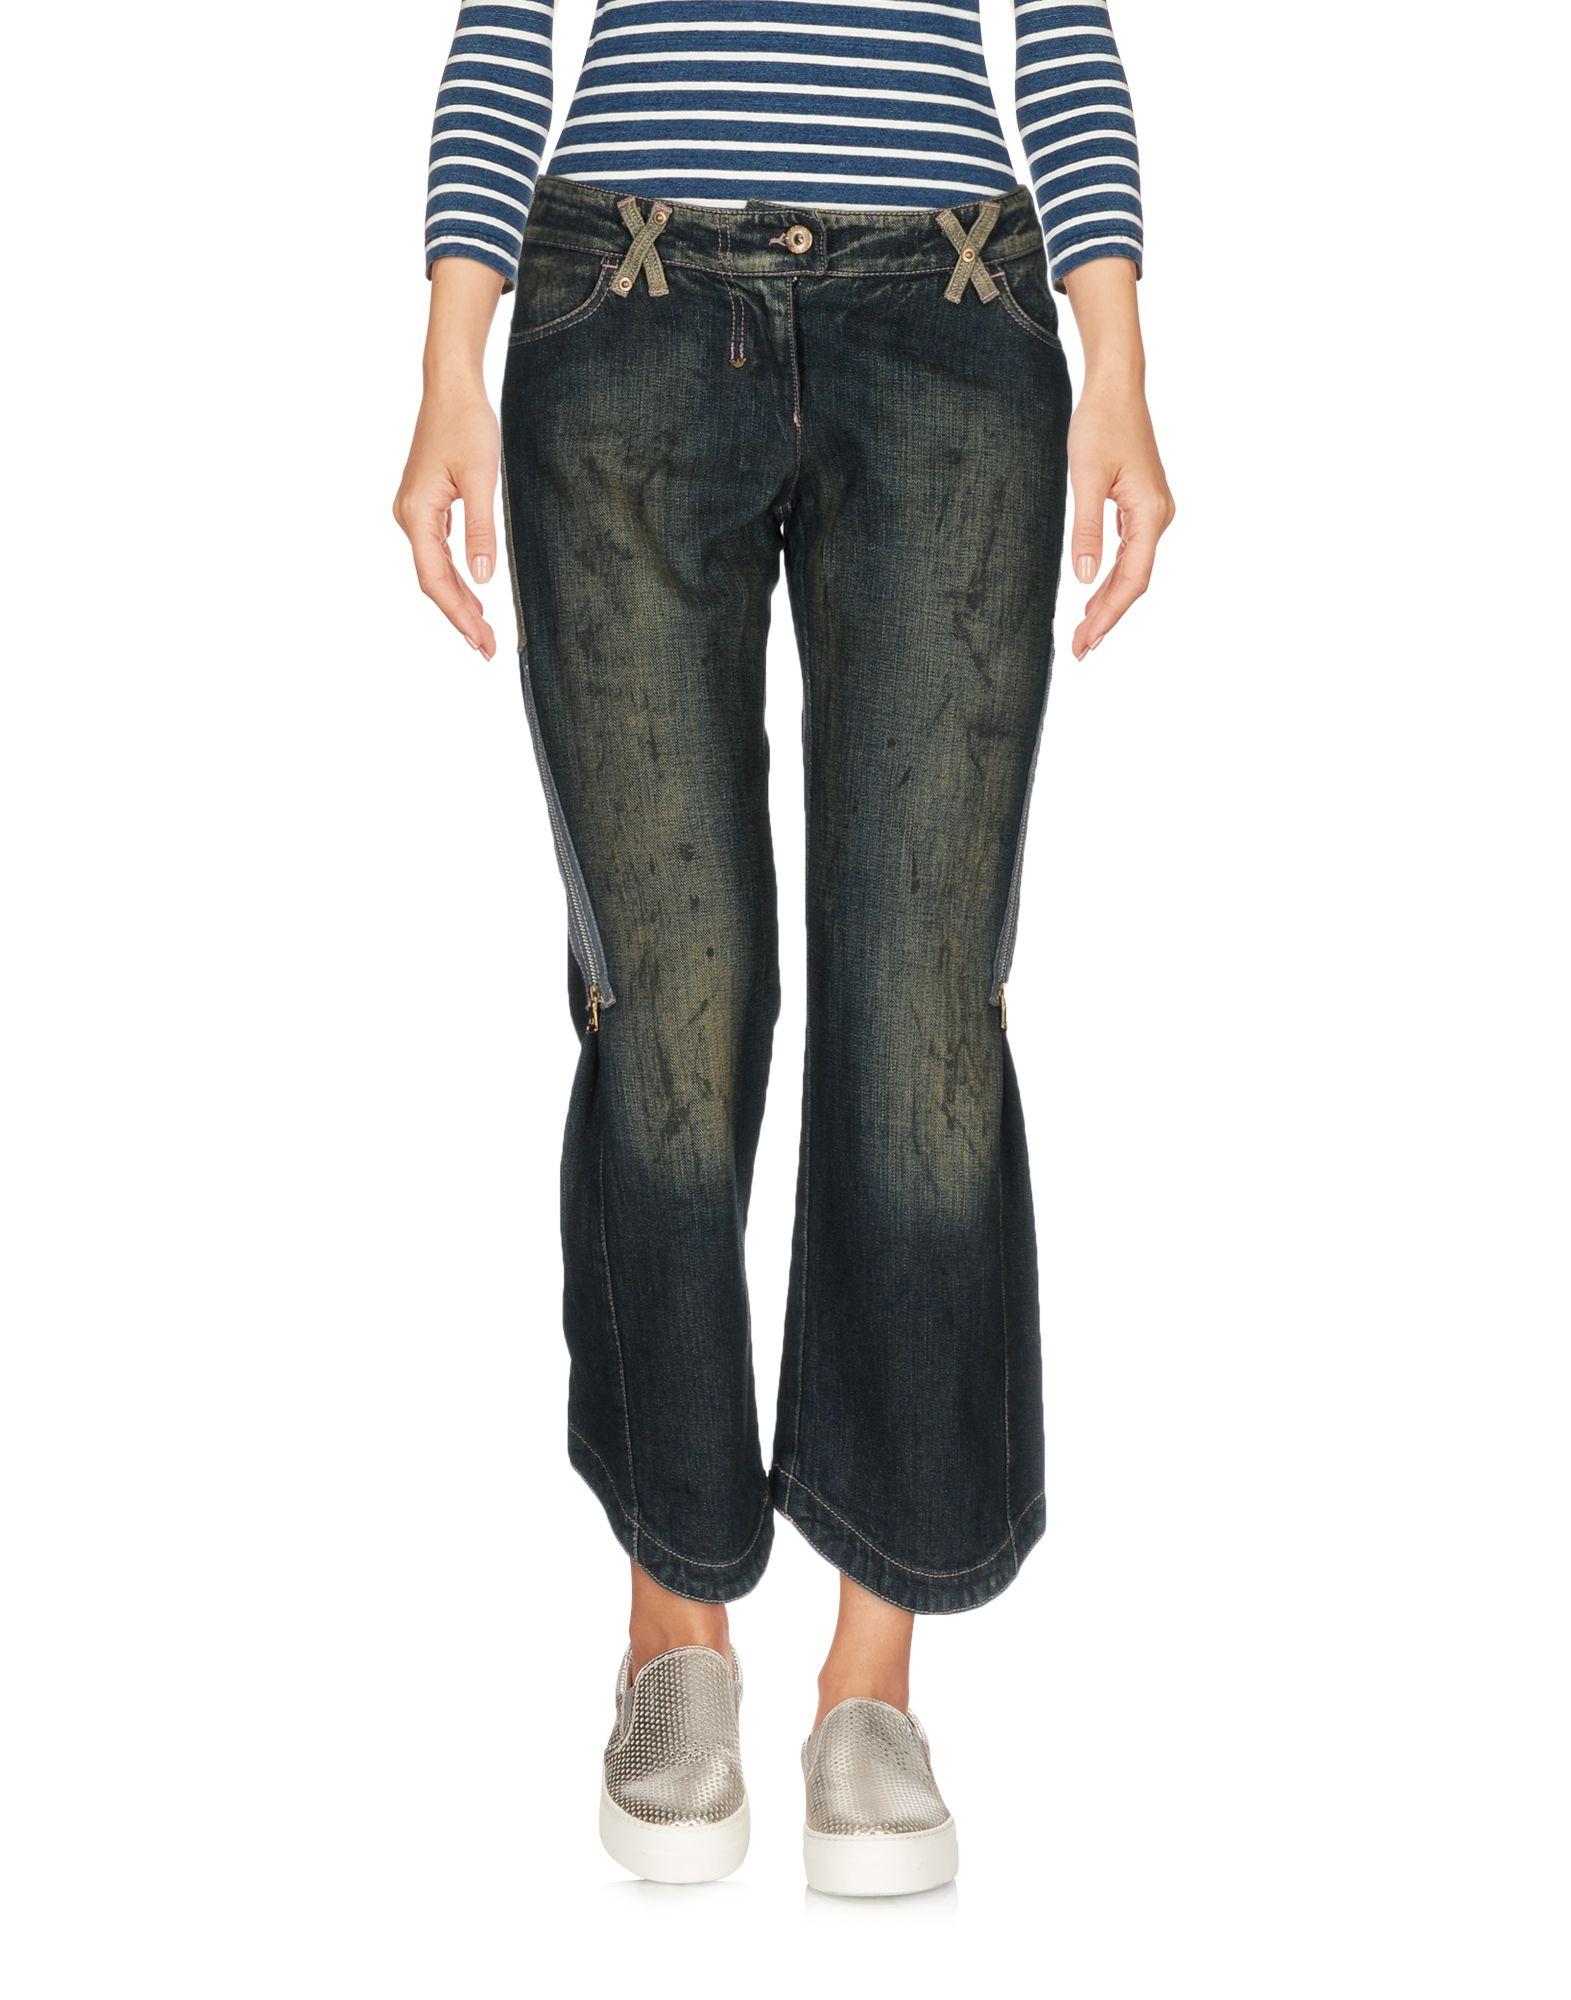 ARMANI JEANS Джинсовые брюки-капри капри armani jeans капри